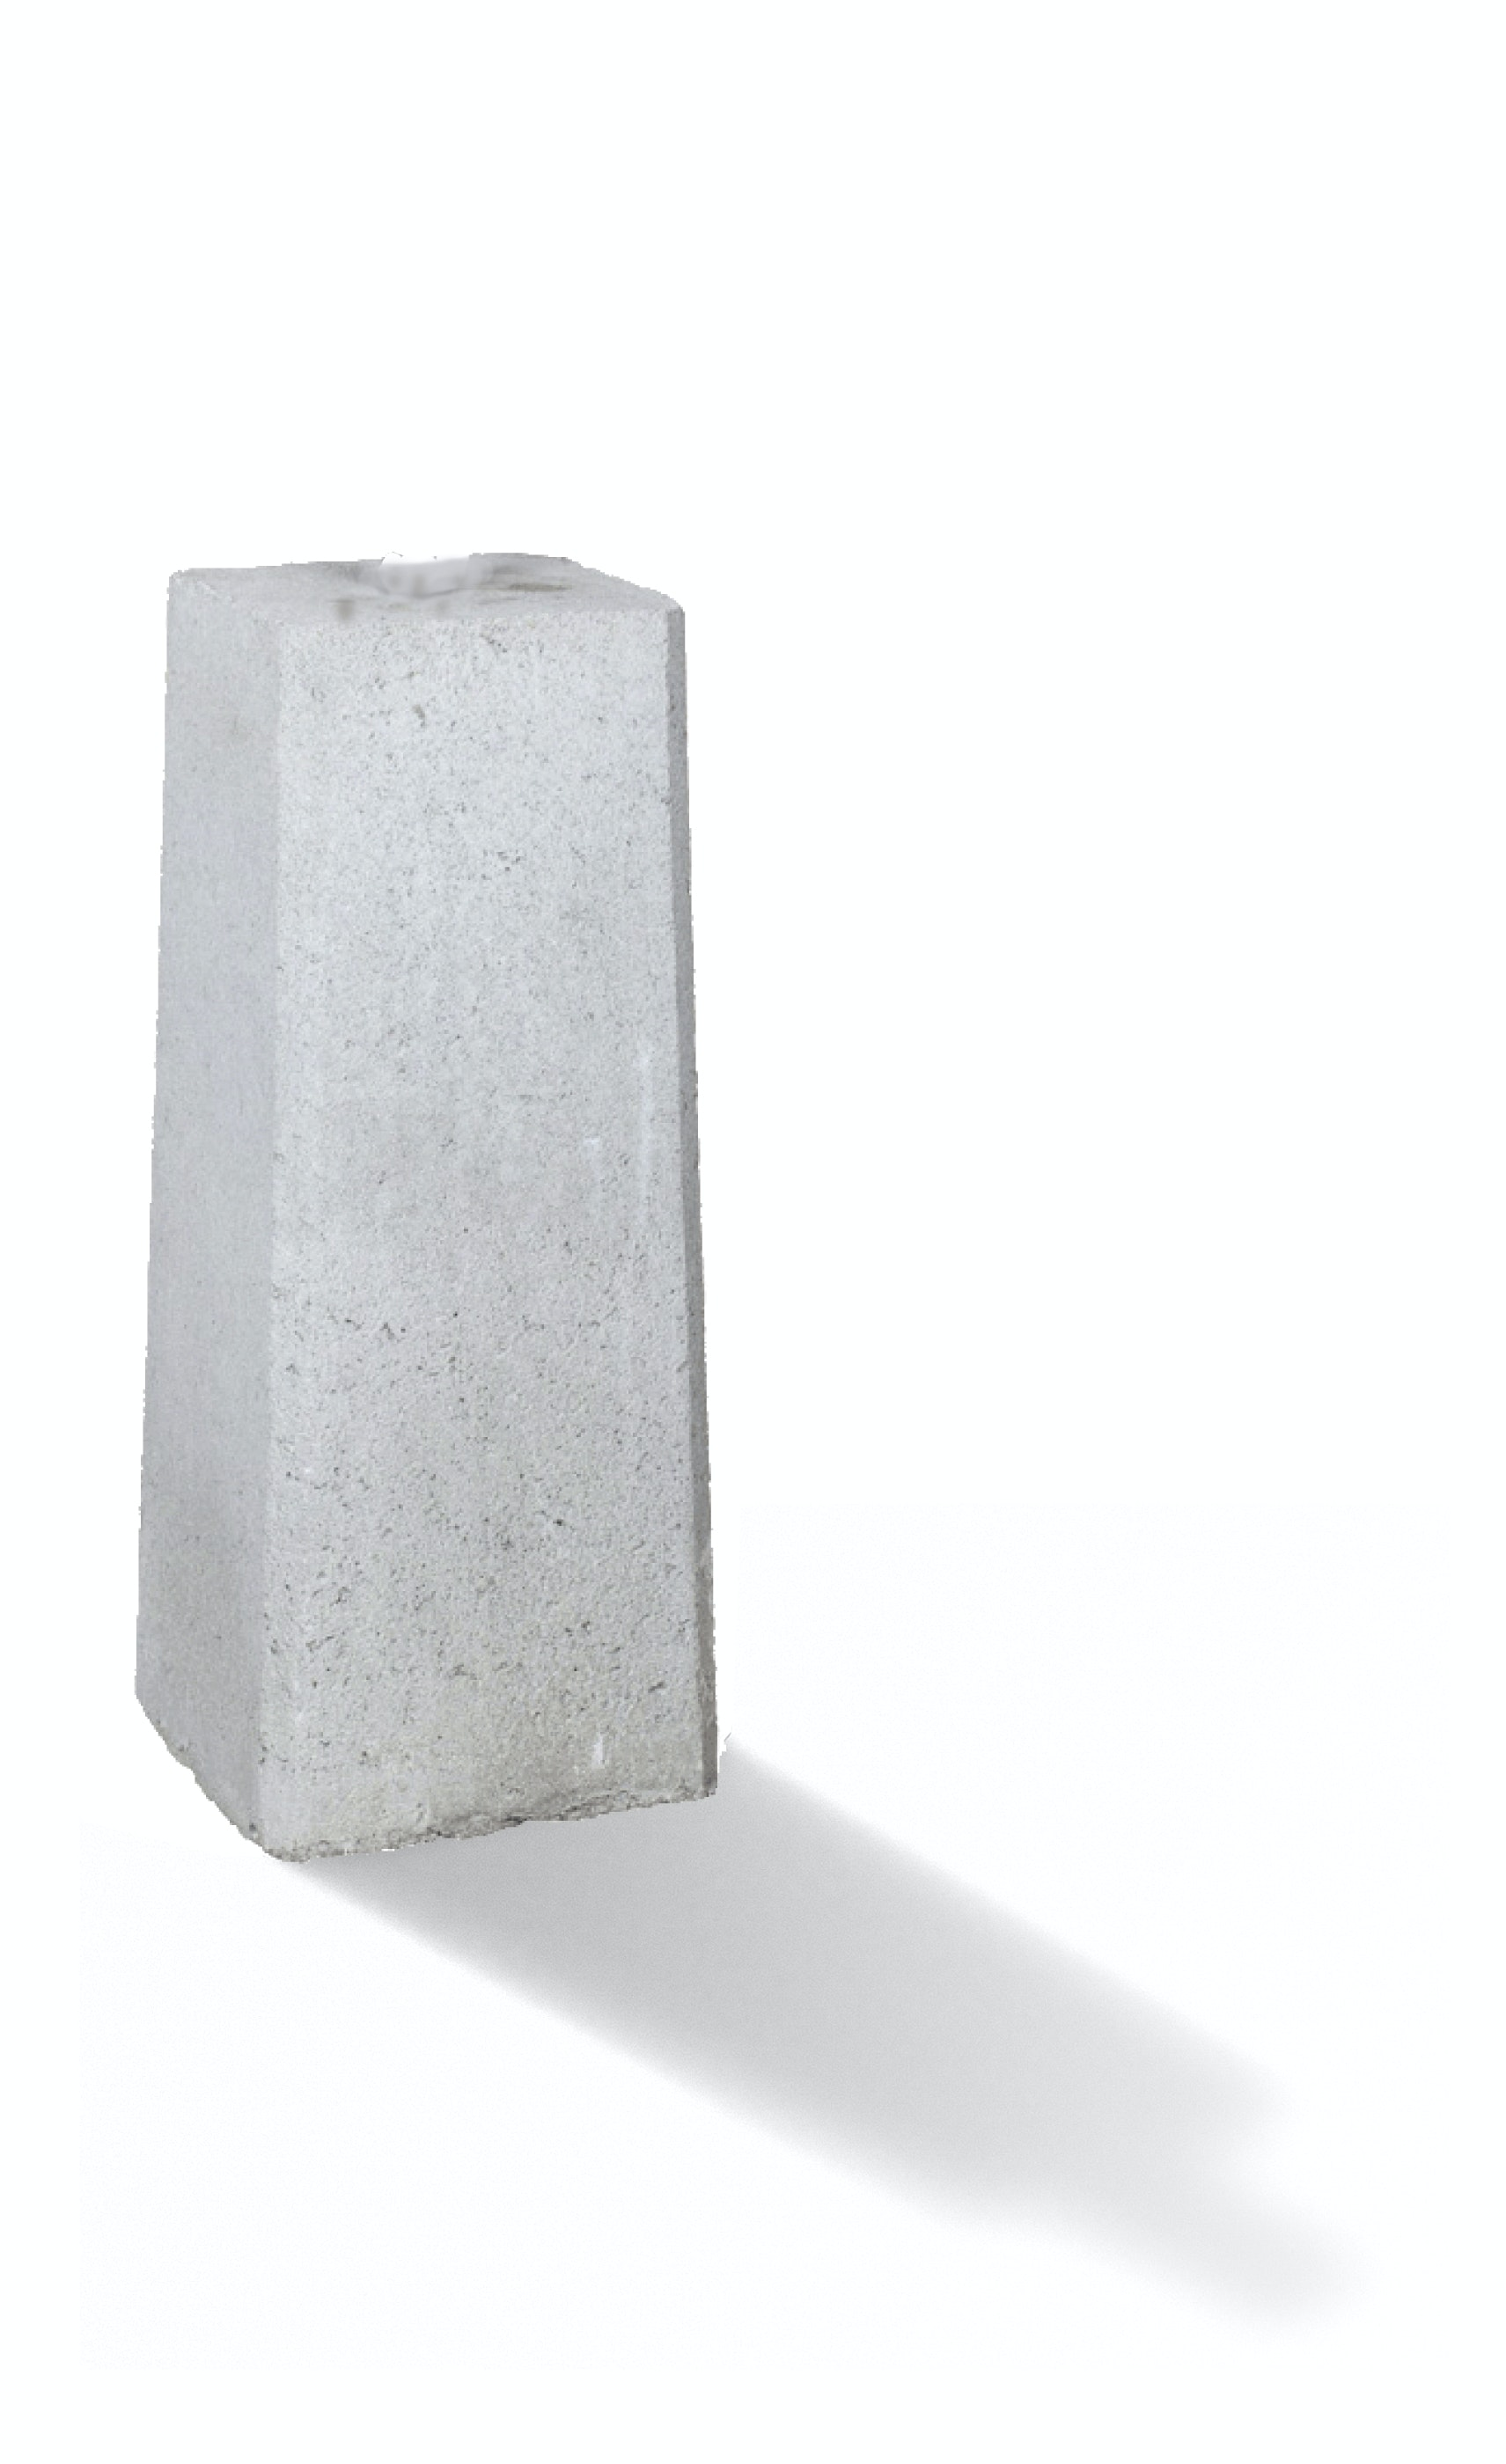 Plint S:t Eriks 700 Ställbart Utan Järn